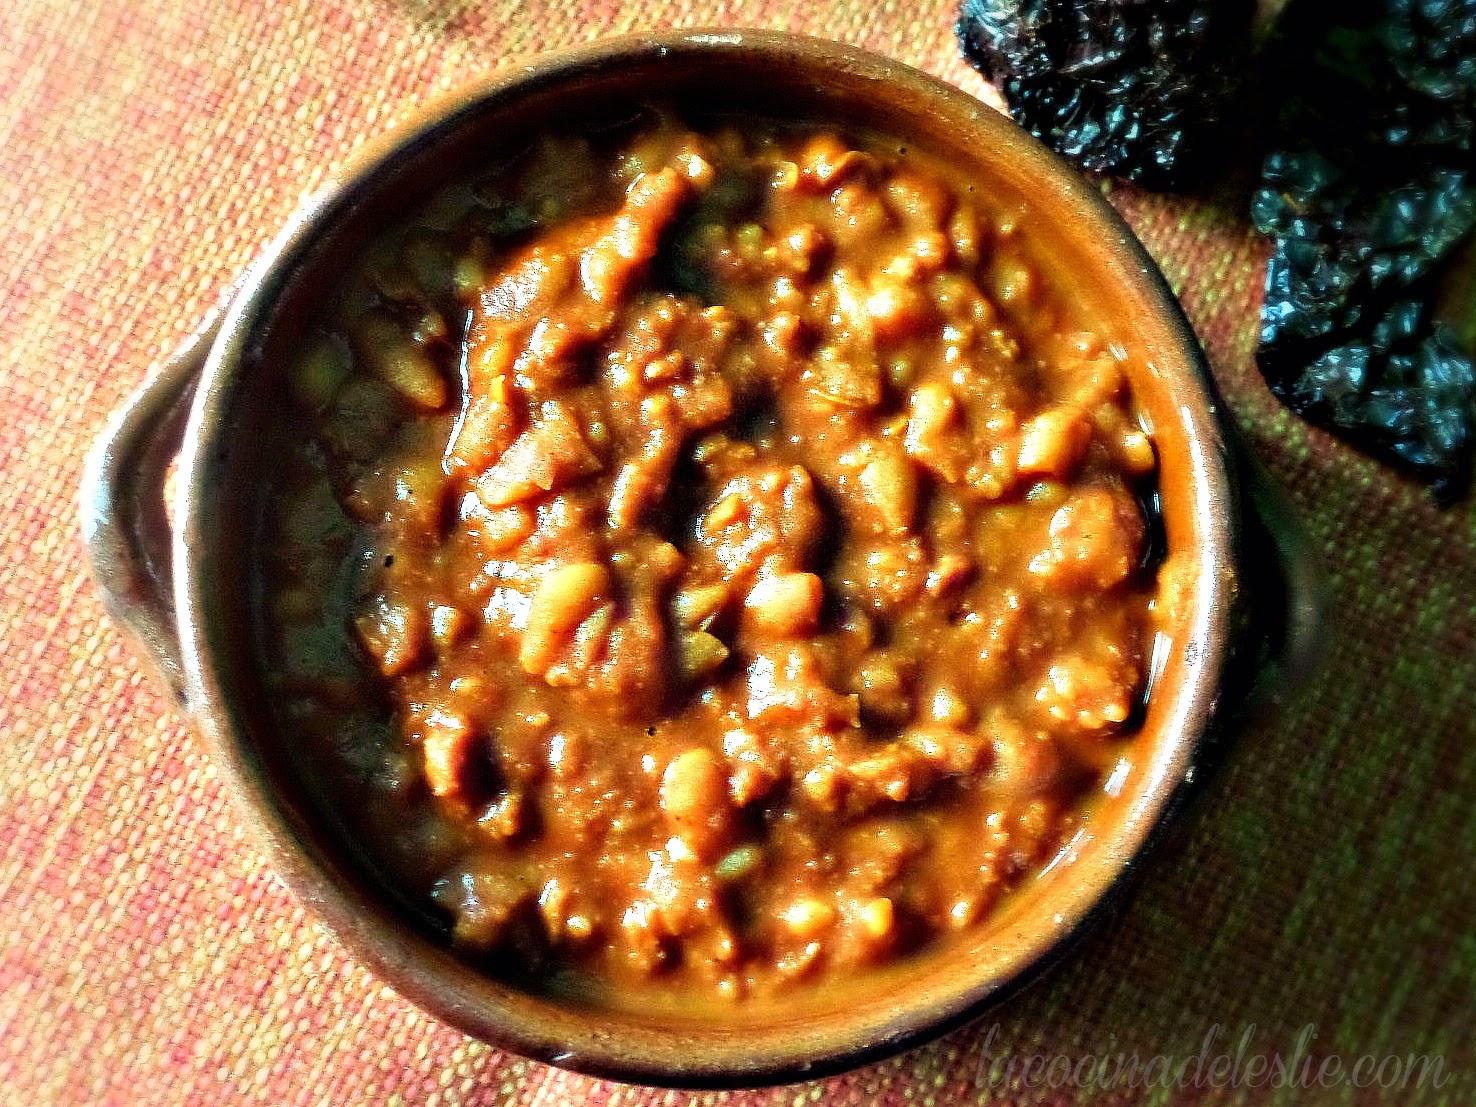 Beans in Adobo Sauce (Frijoles Adobados) - lacocinadeleslie.com